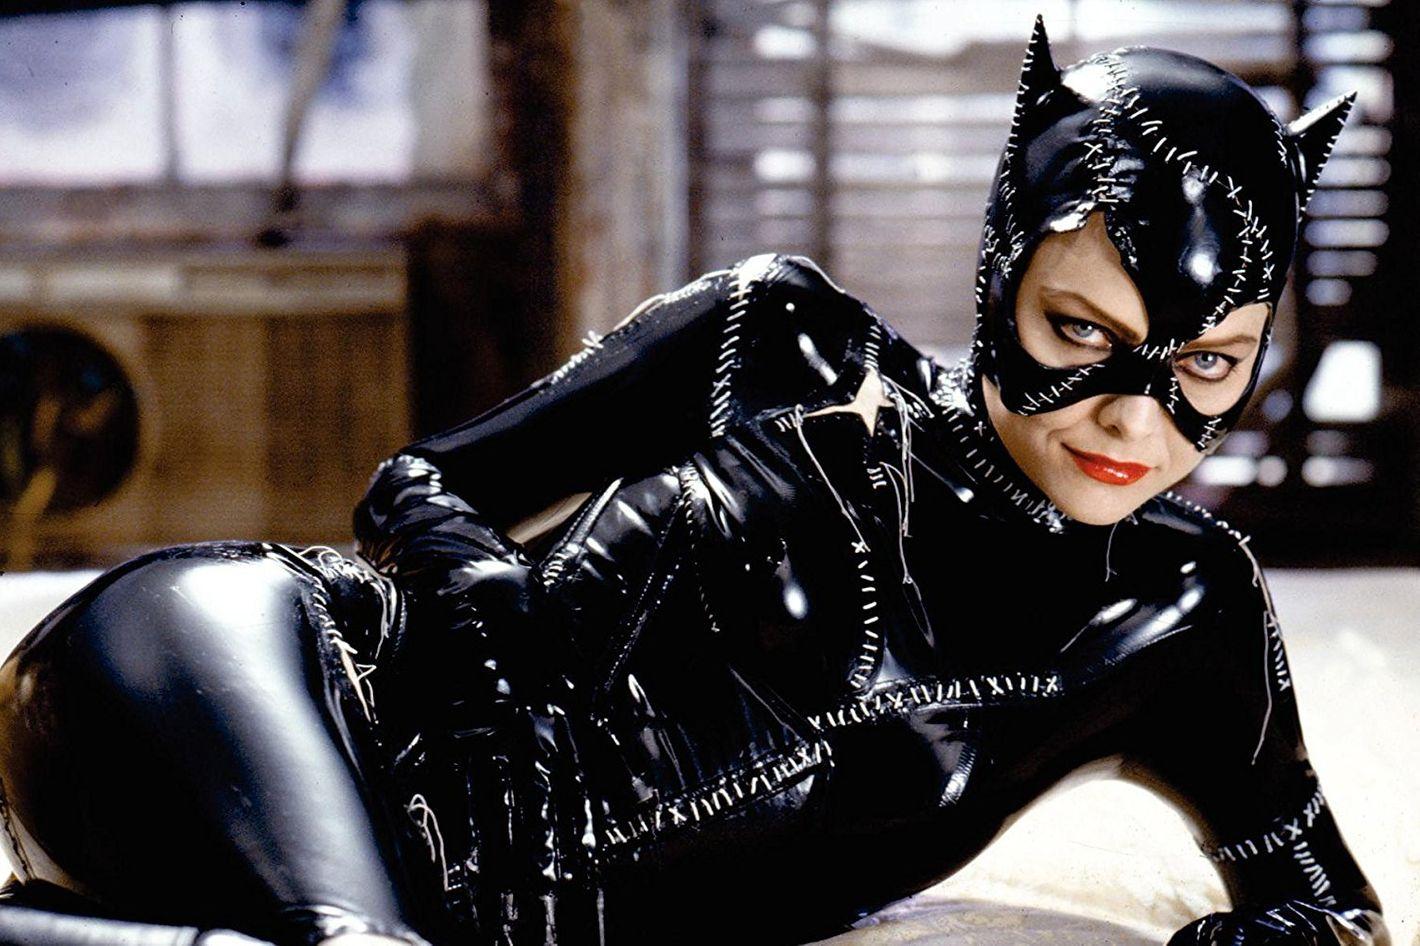 The 25 Best Movie Supervillains, Ranked